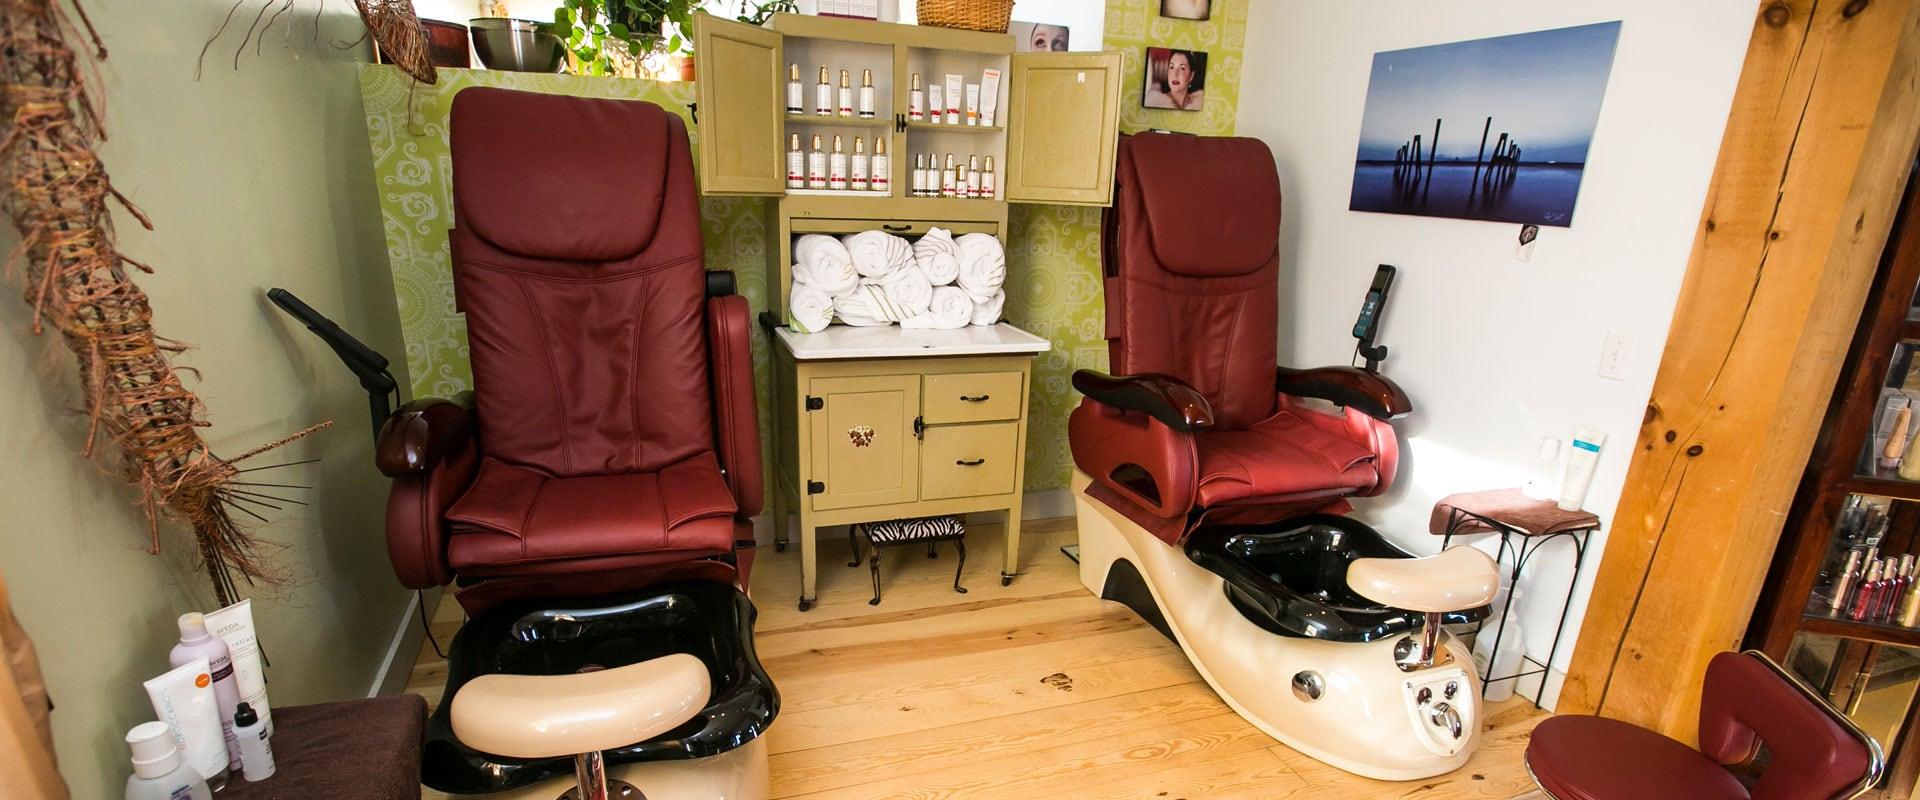 Body - Debony Salon